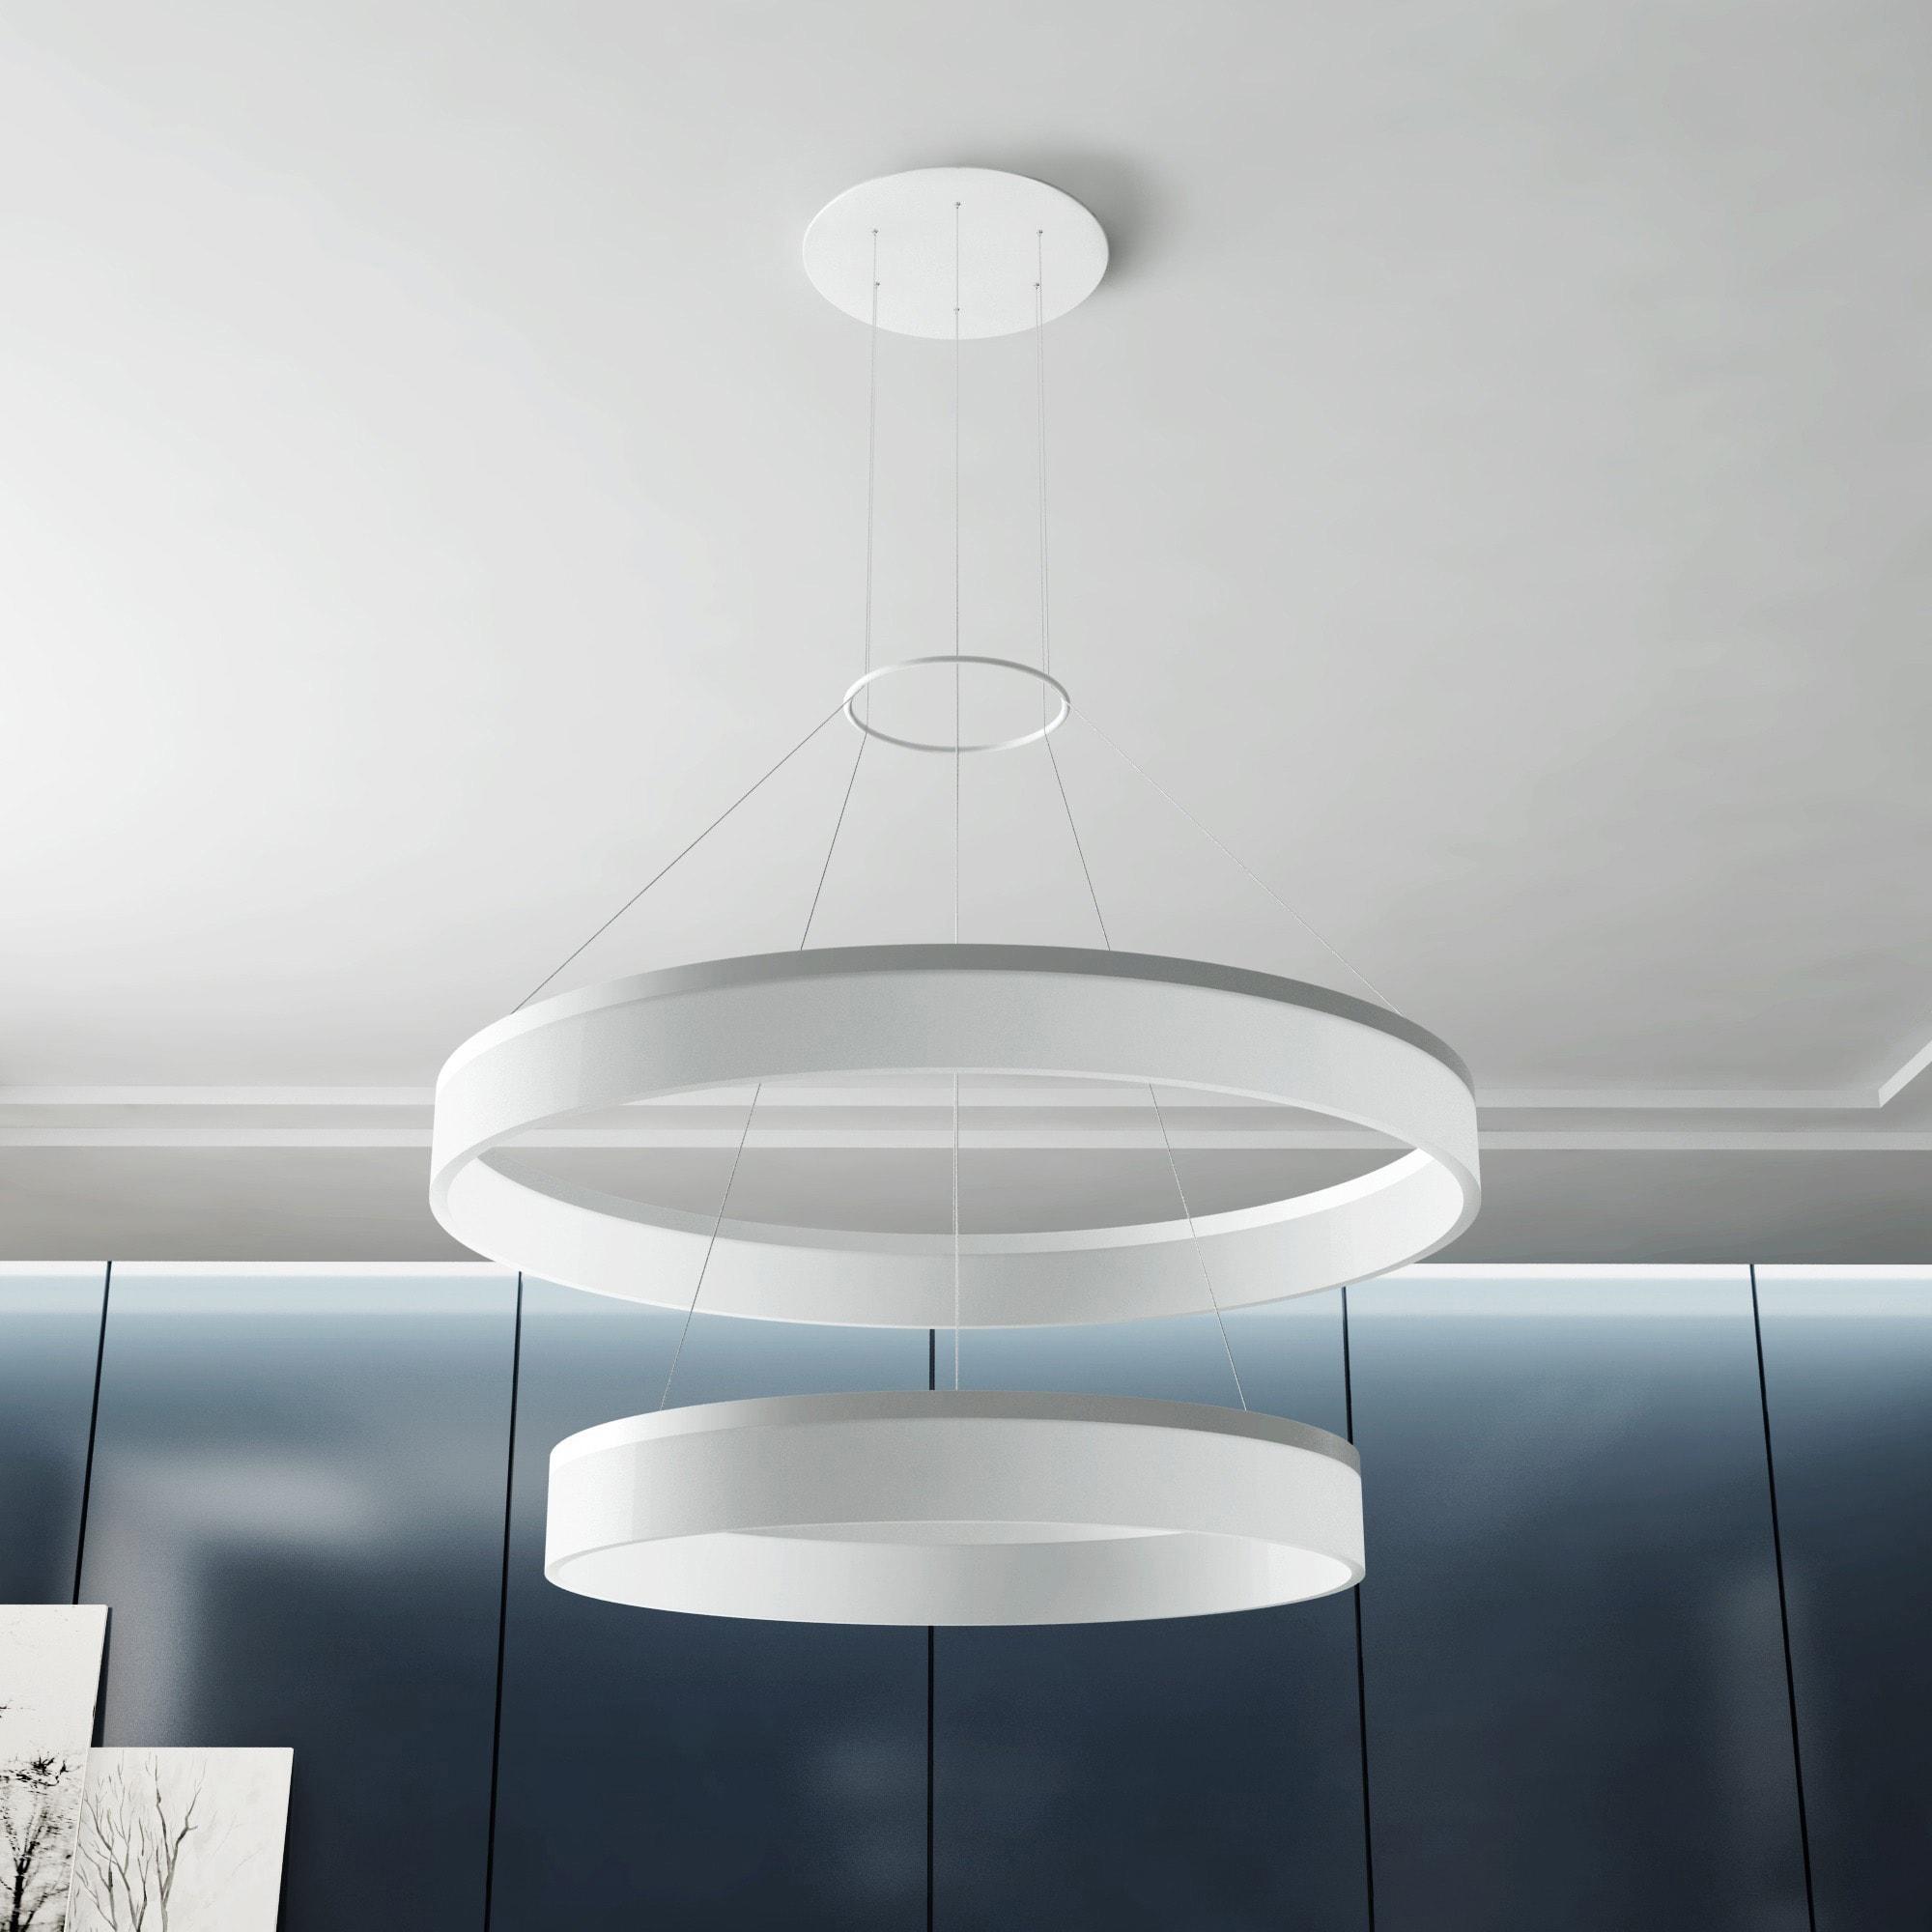 VONN Lighting Tania Duo 23-inch LED Two-tier Satin Nickel Orbicular Chandelier